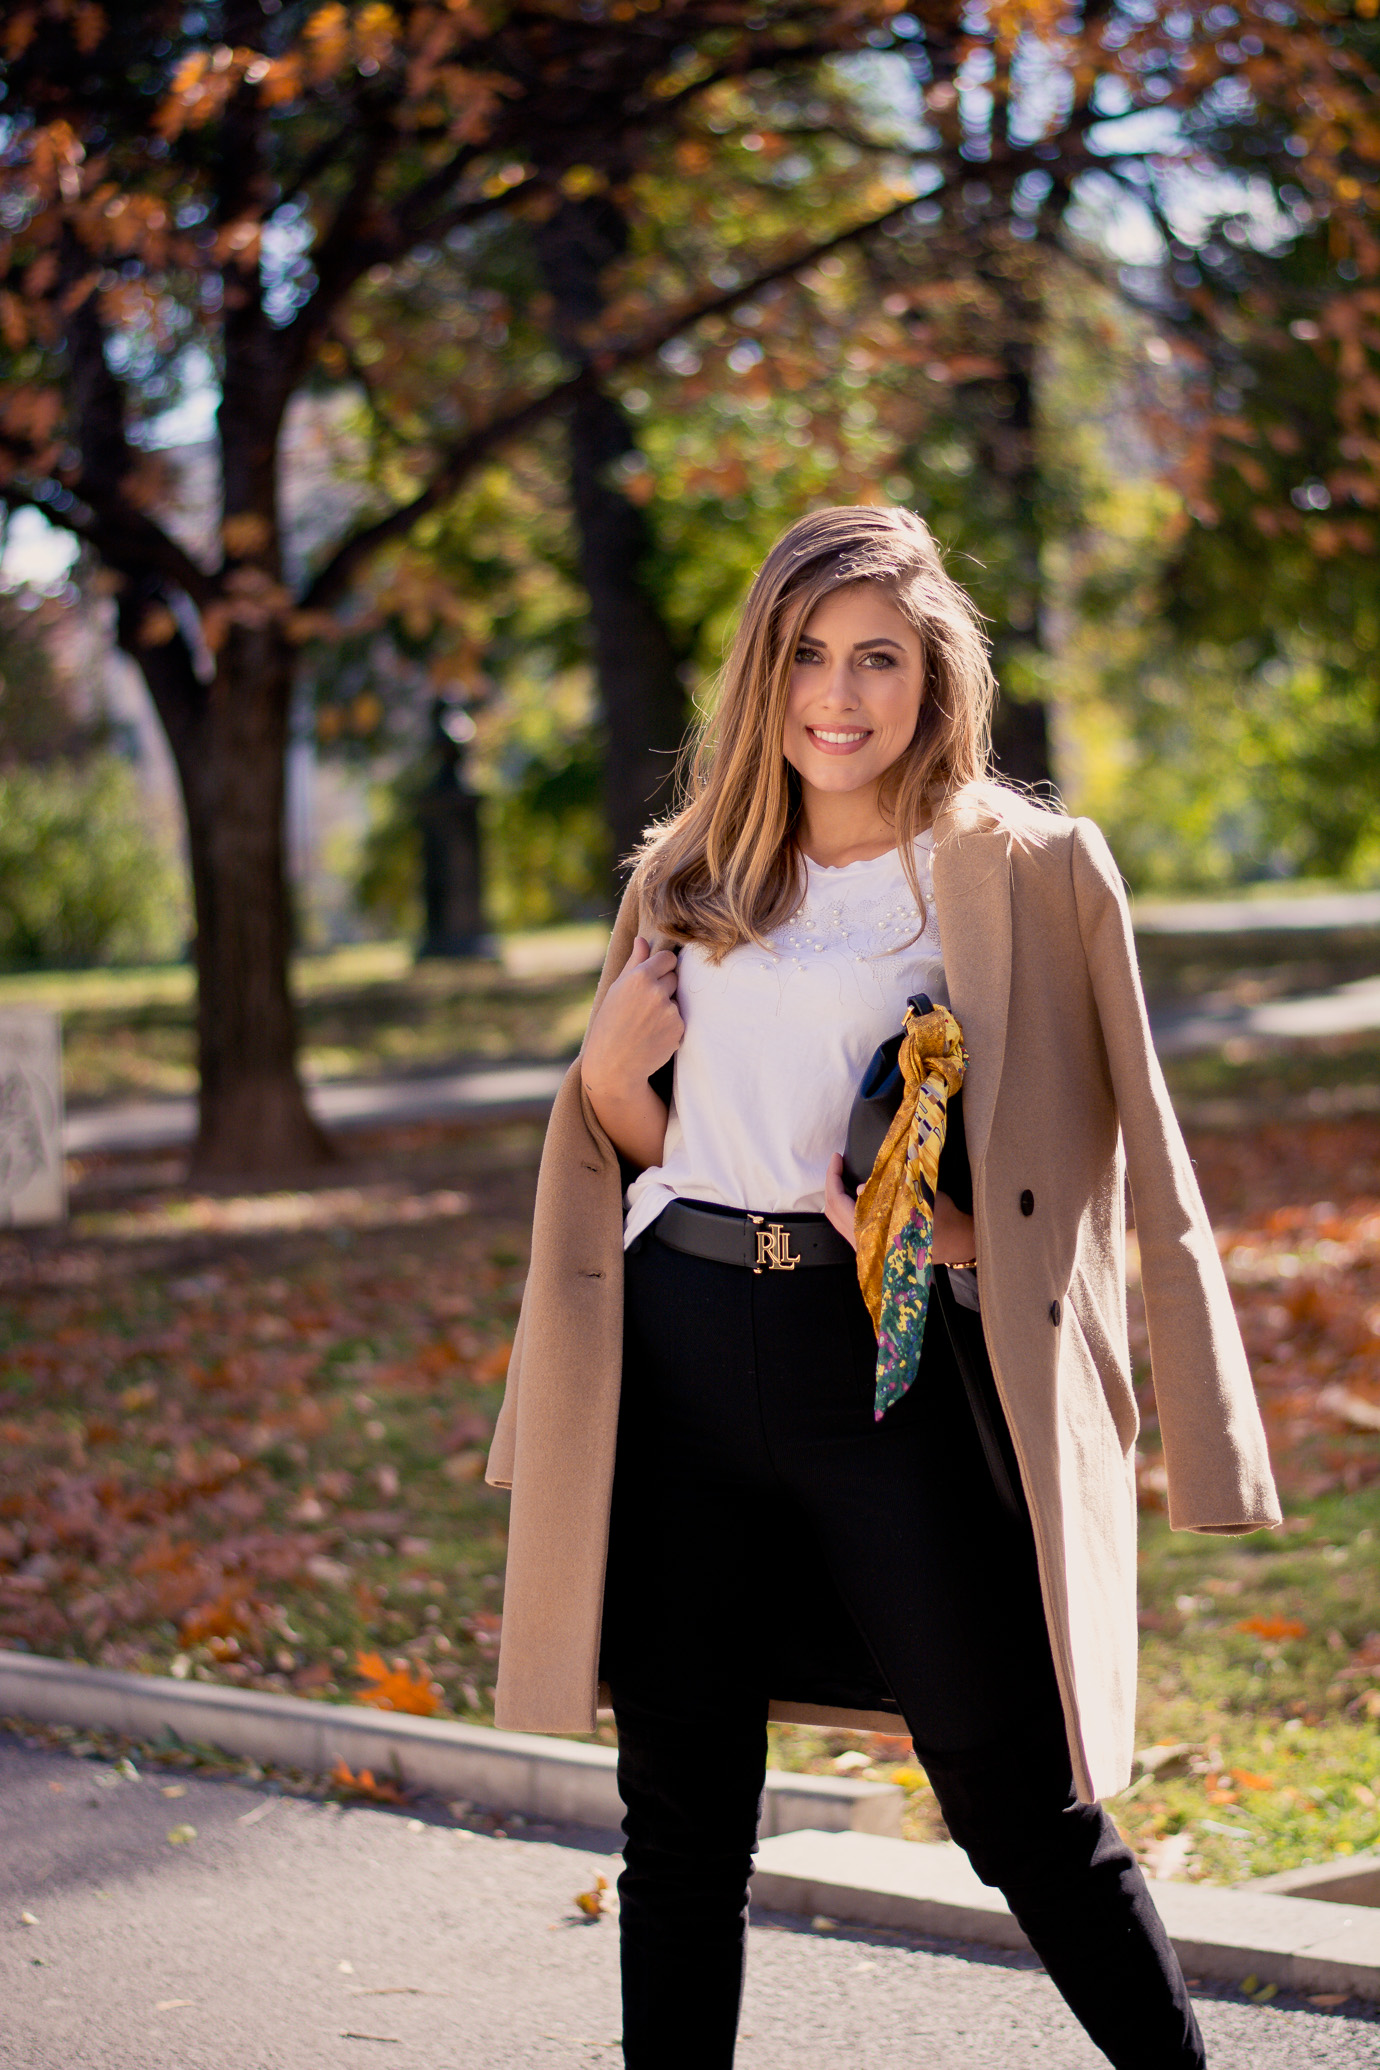 Estee Lauder beauty fashion blogger